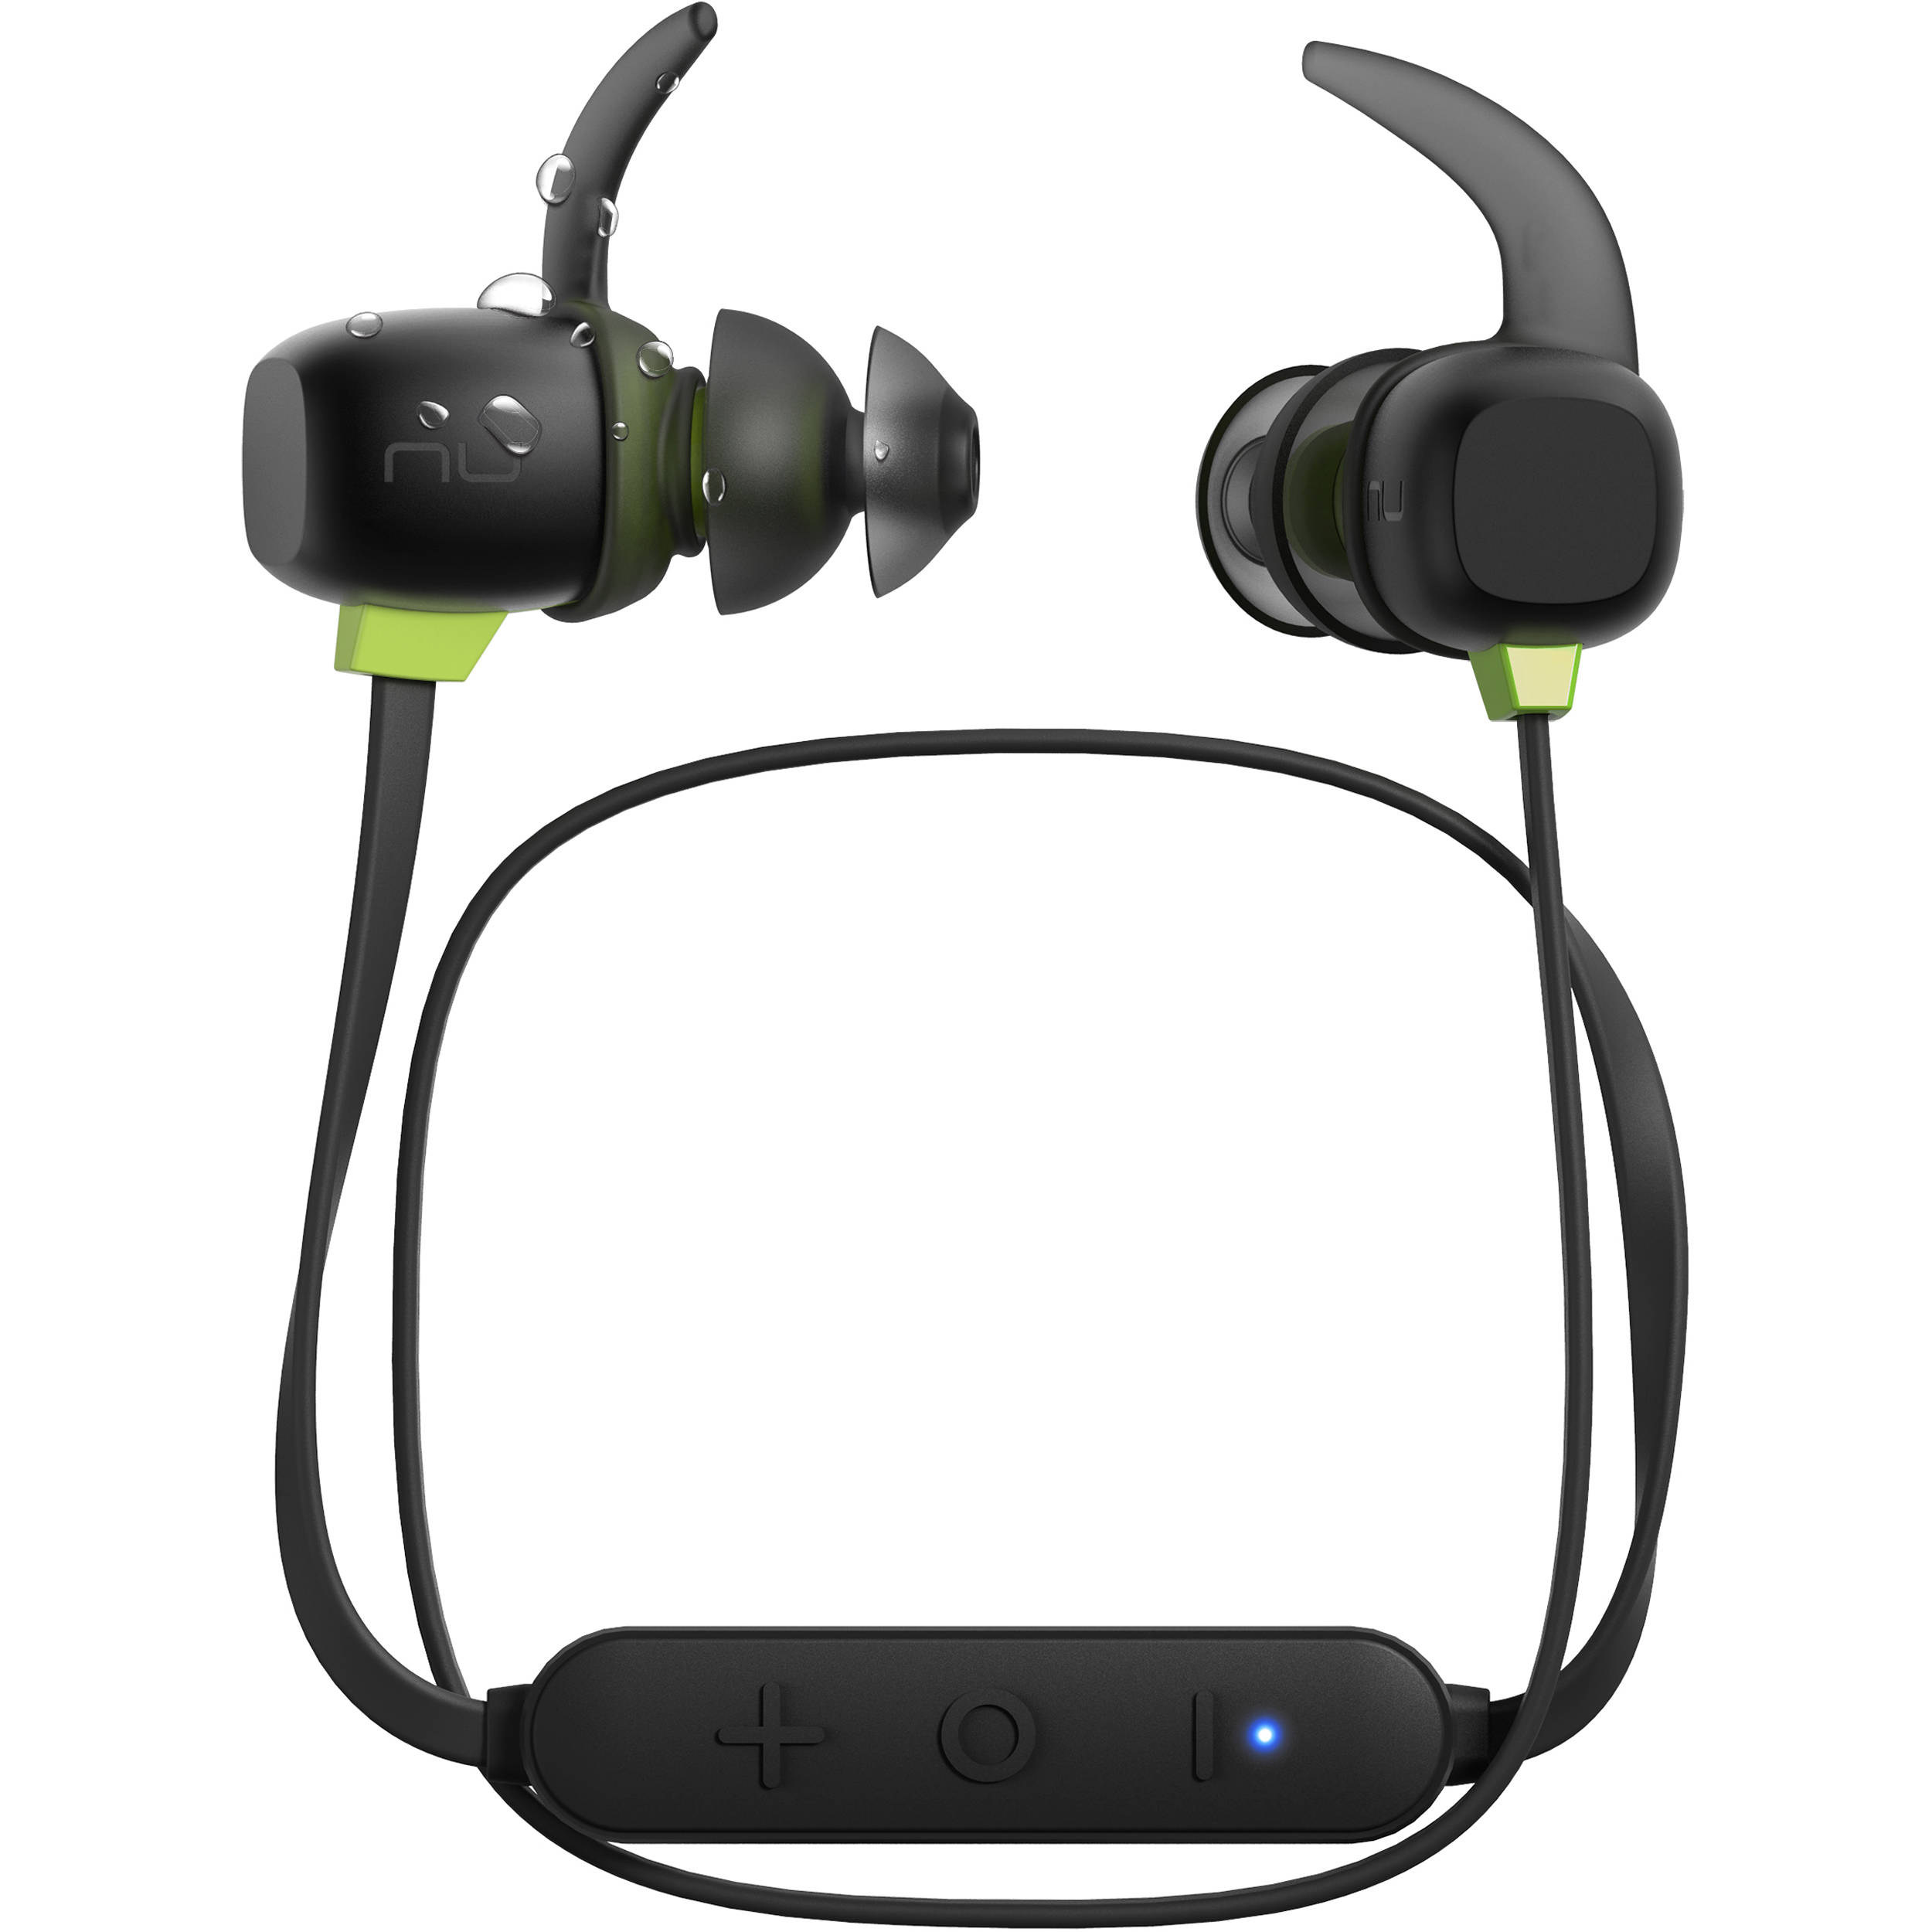 Https C Product 1424788 Reg Custom Wiring Harness Ls M S2 Nuforce Besport4 Black Be Sport4 Premium Wireless 1425910